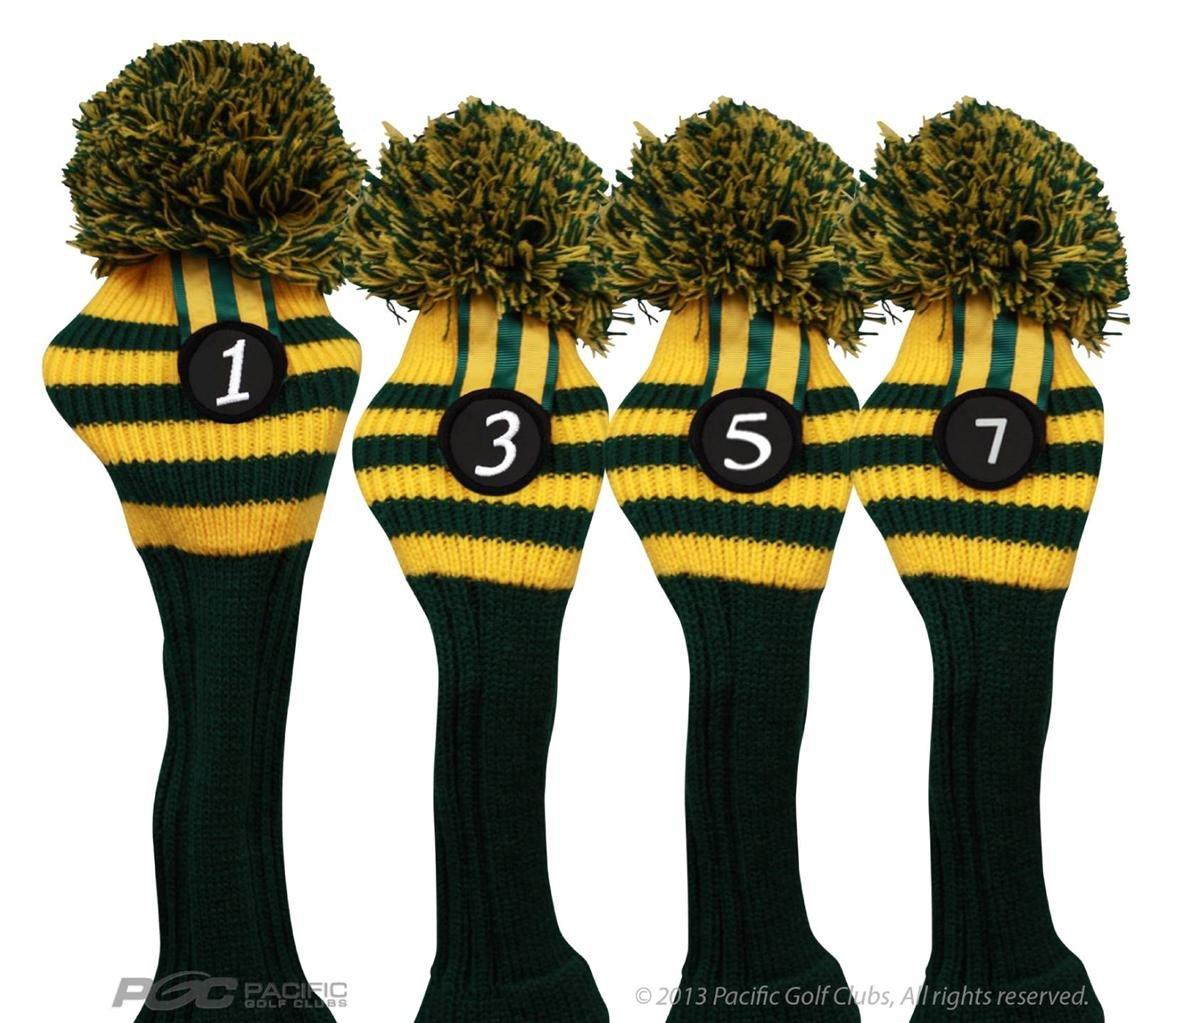 Pacificゴルフクラブヘッドカバー1 3 5 7緑とYelllowニットレトロ古い学校ヴィンテージストライプポンポン付きThrowbackクラシック B01B3OHVP8